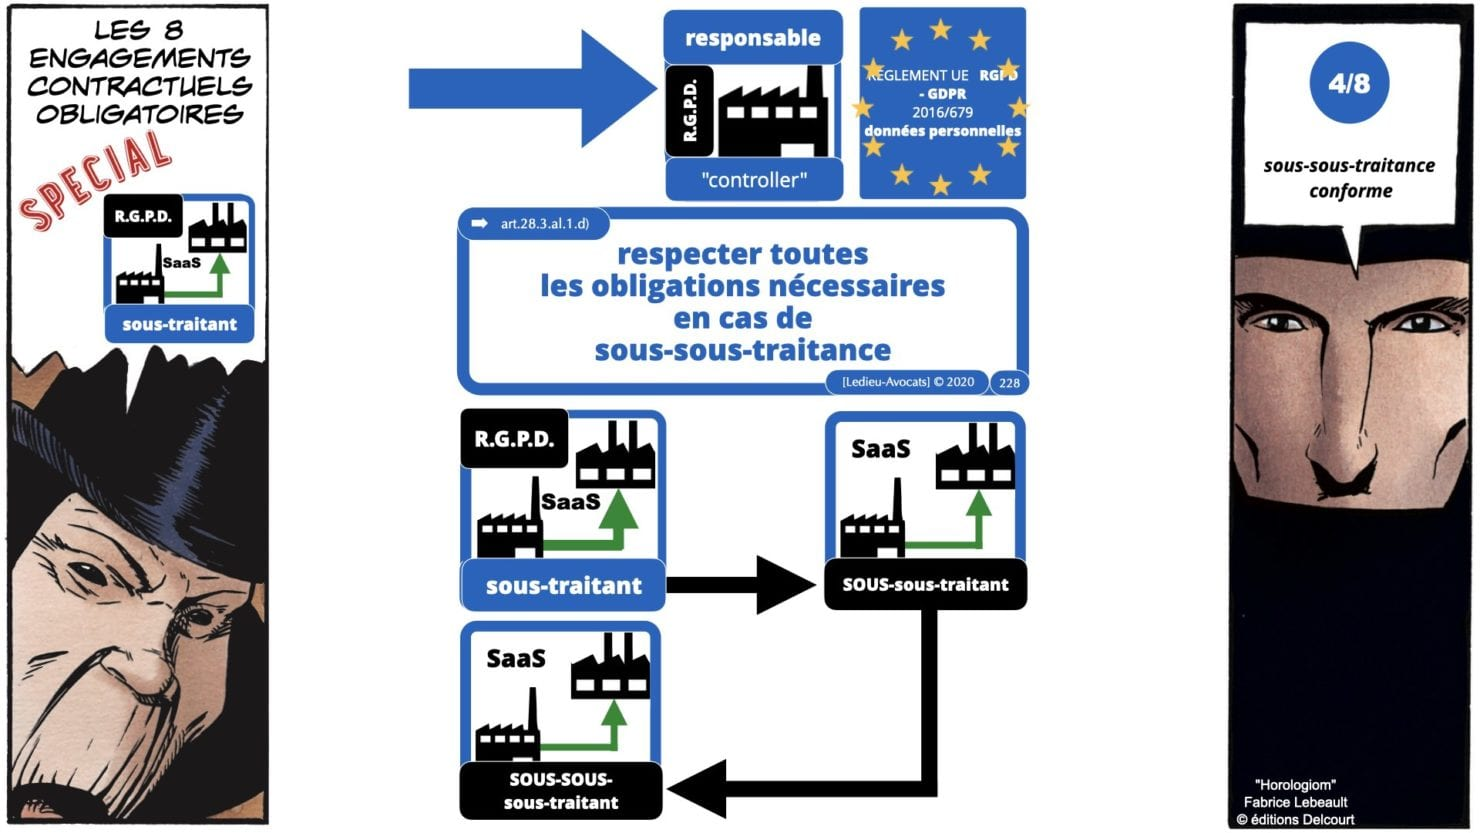 RGPD e-Privacy principes actualité jurisprudence ©Ledieu-Avocats 25-06-2021.228